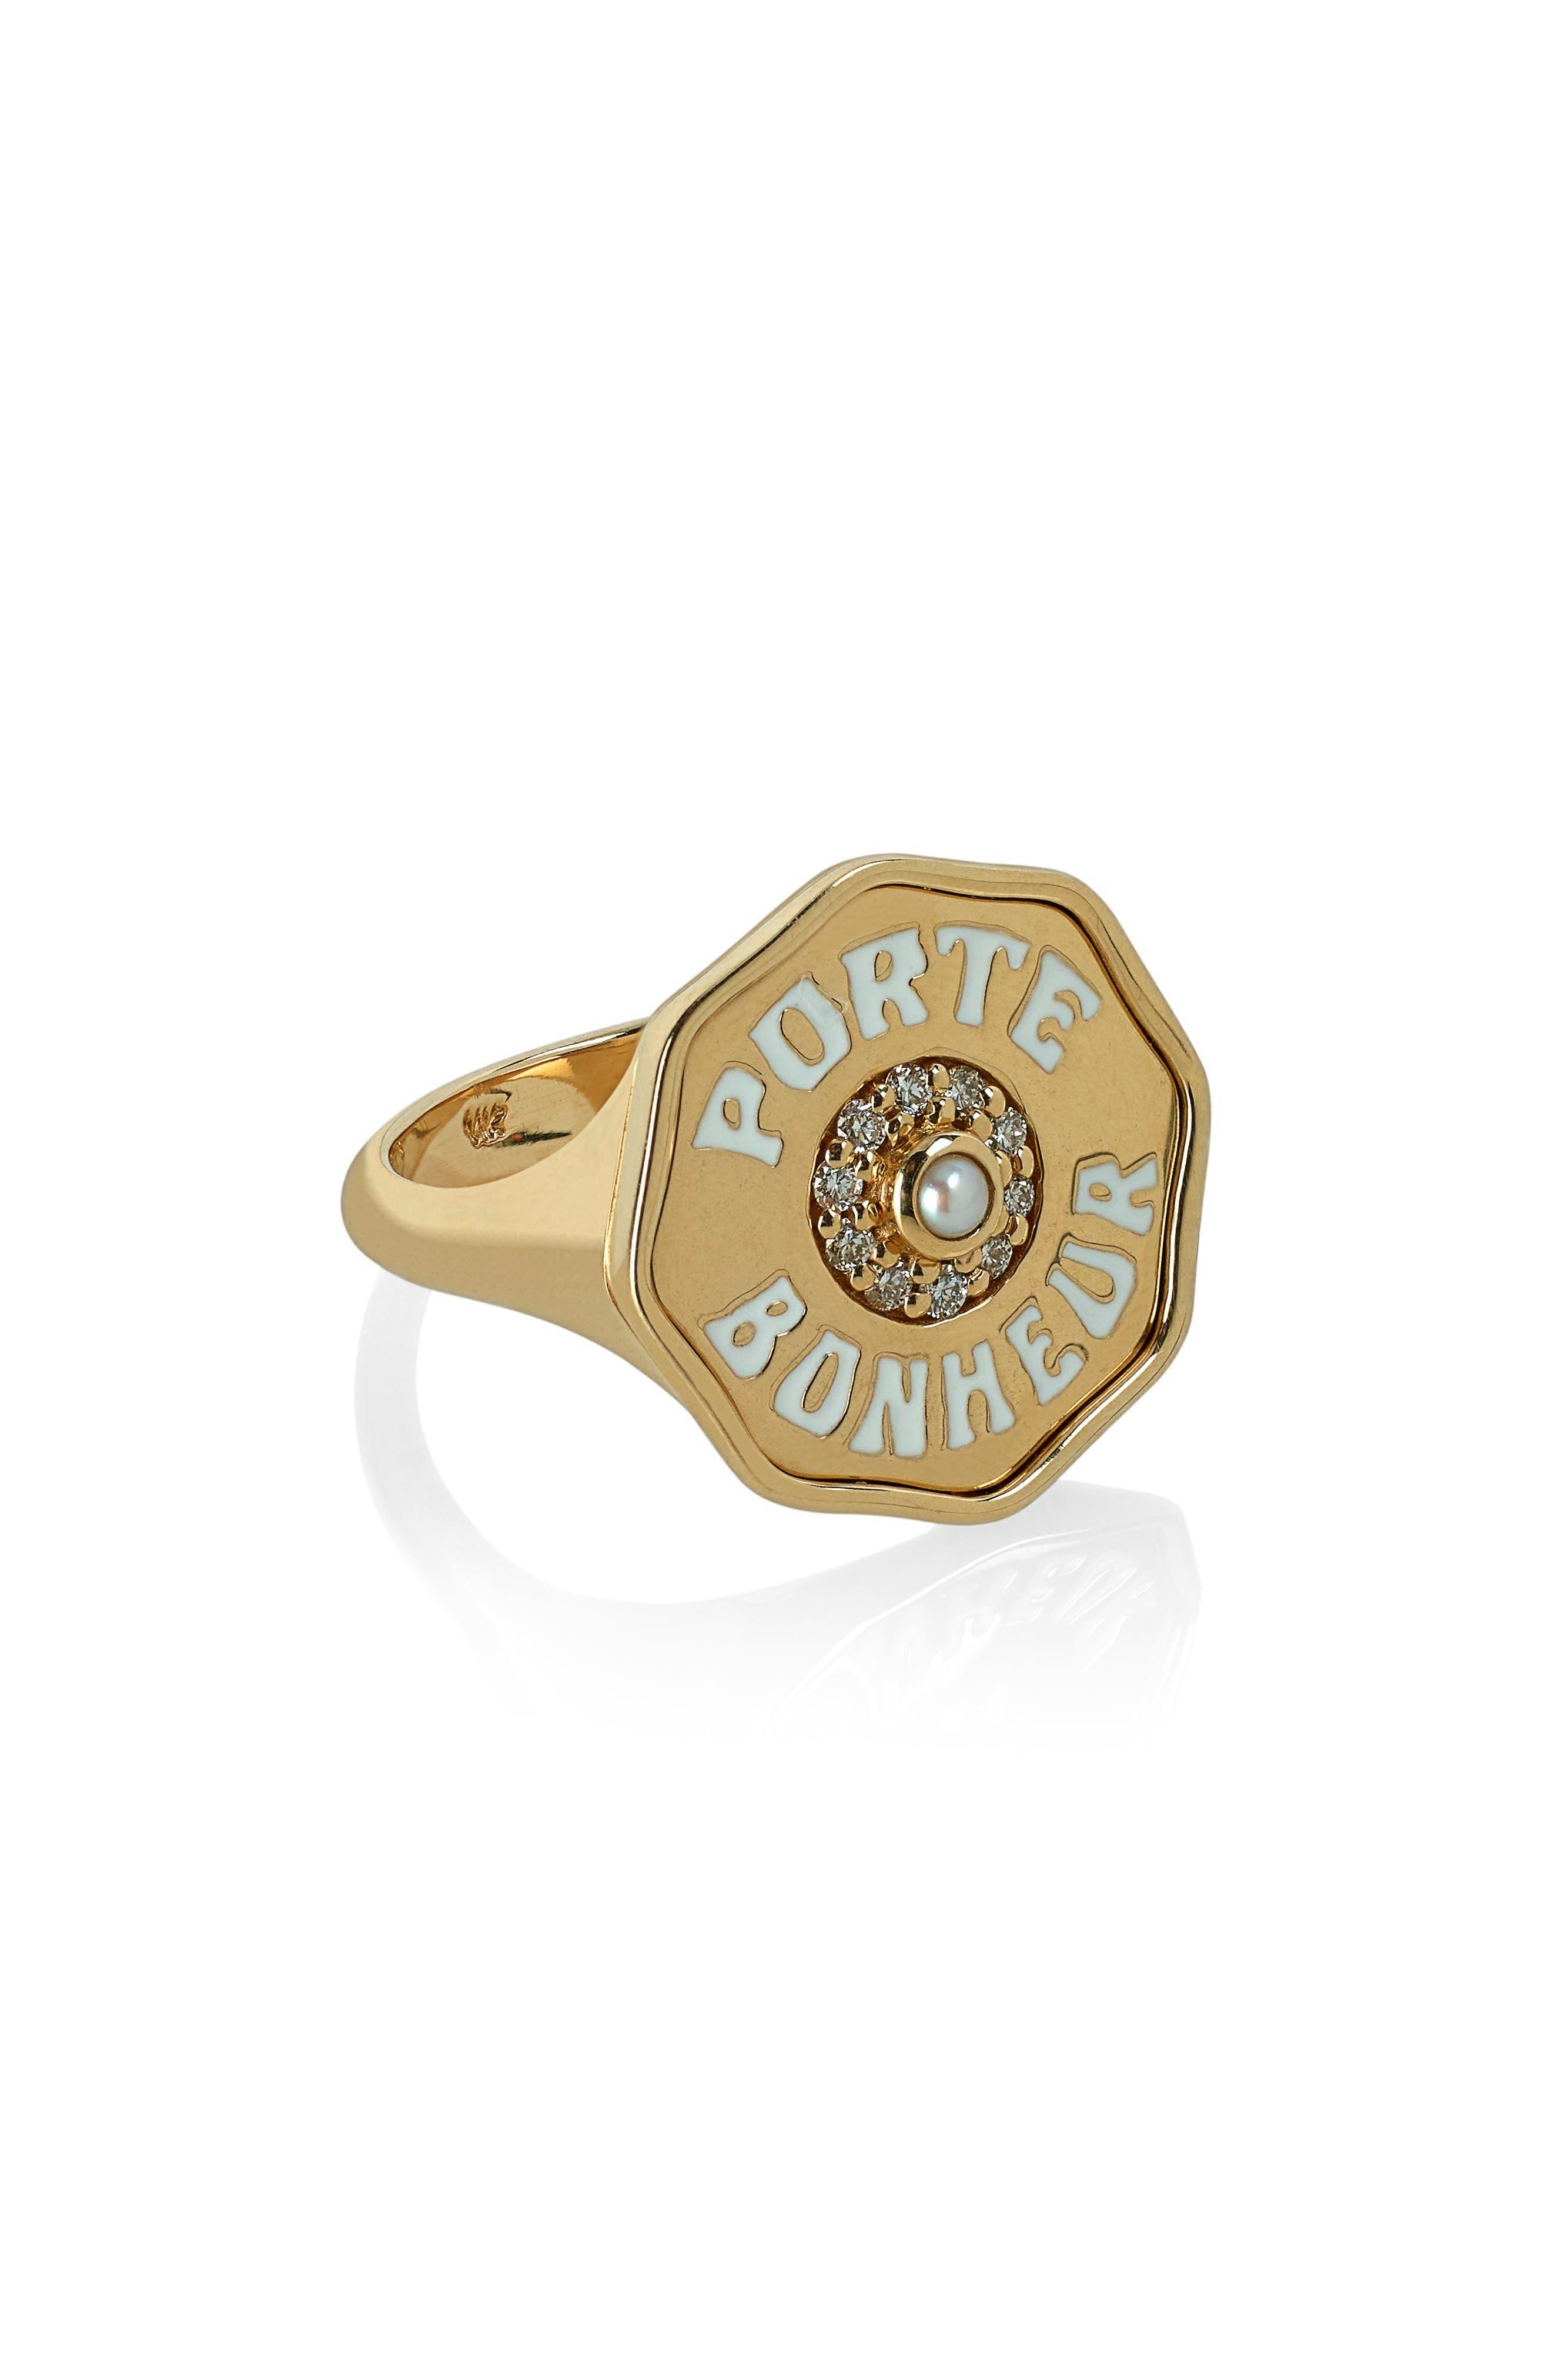 Marlo Laz Porte Bonhuer Coin Ring